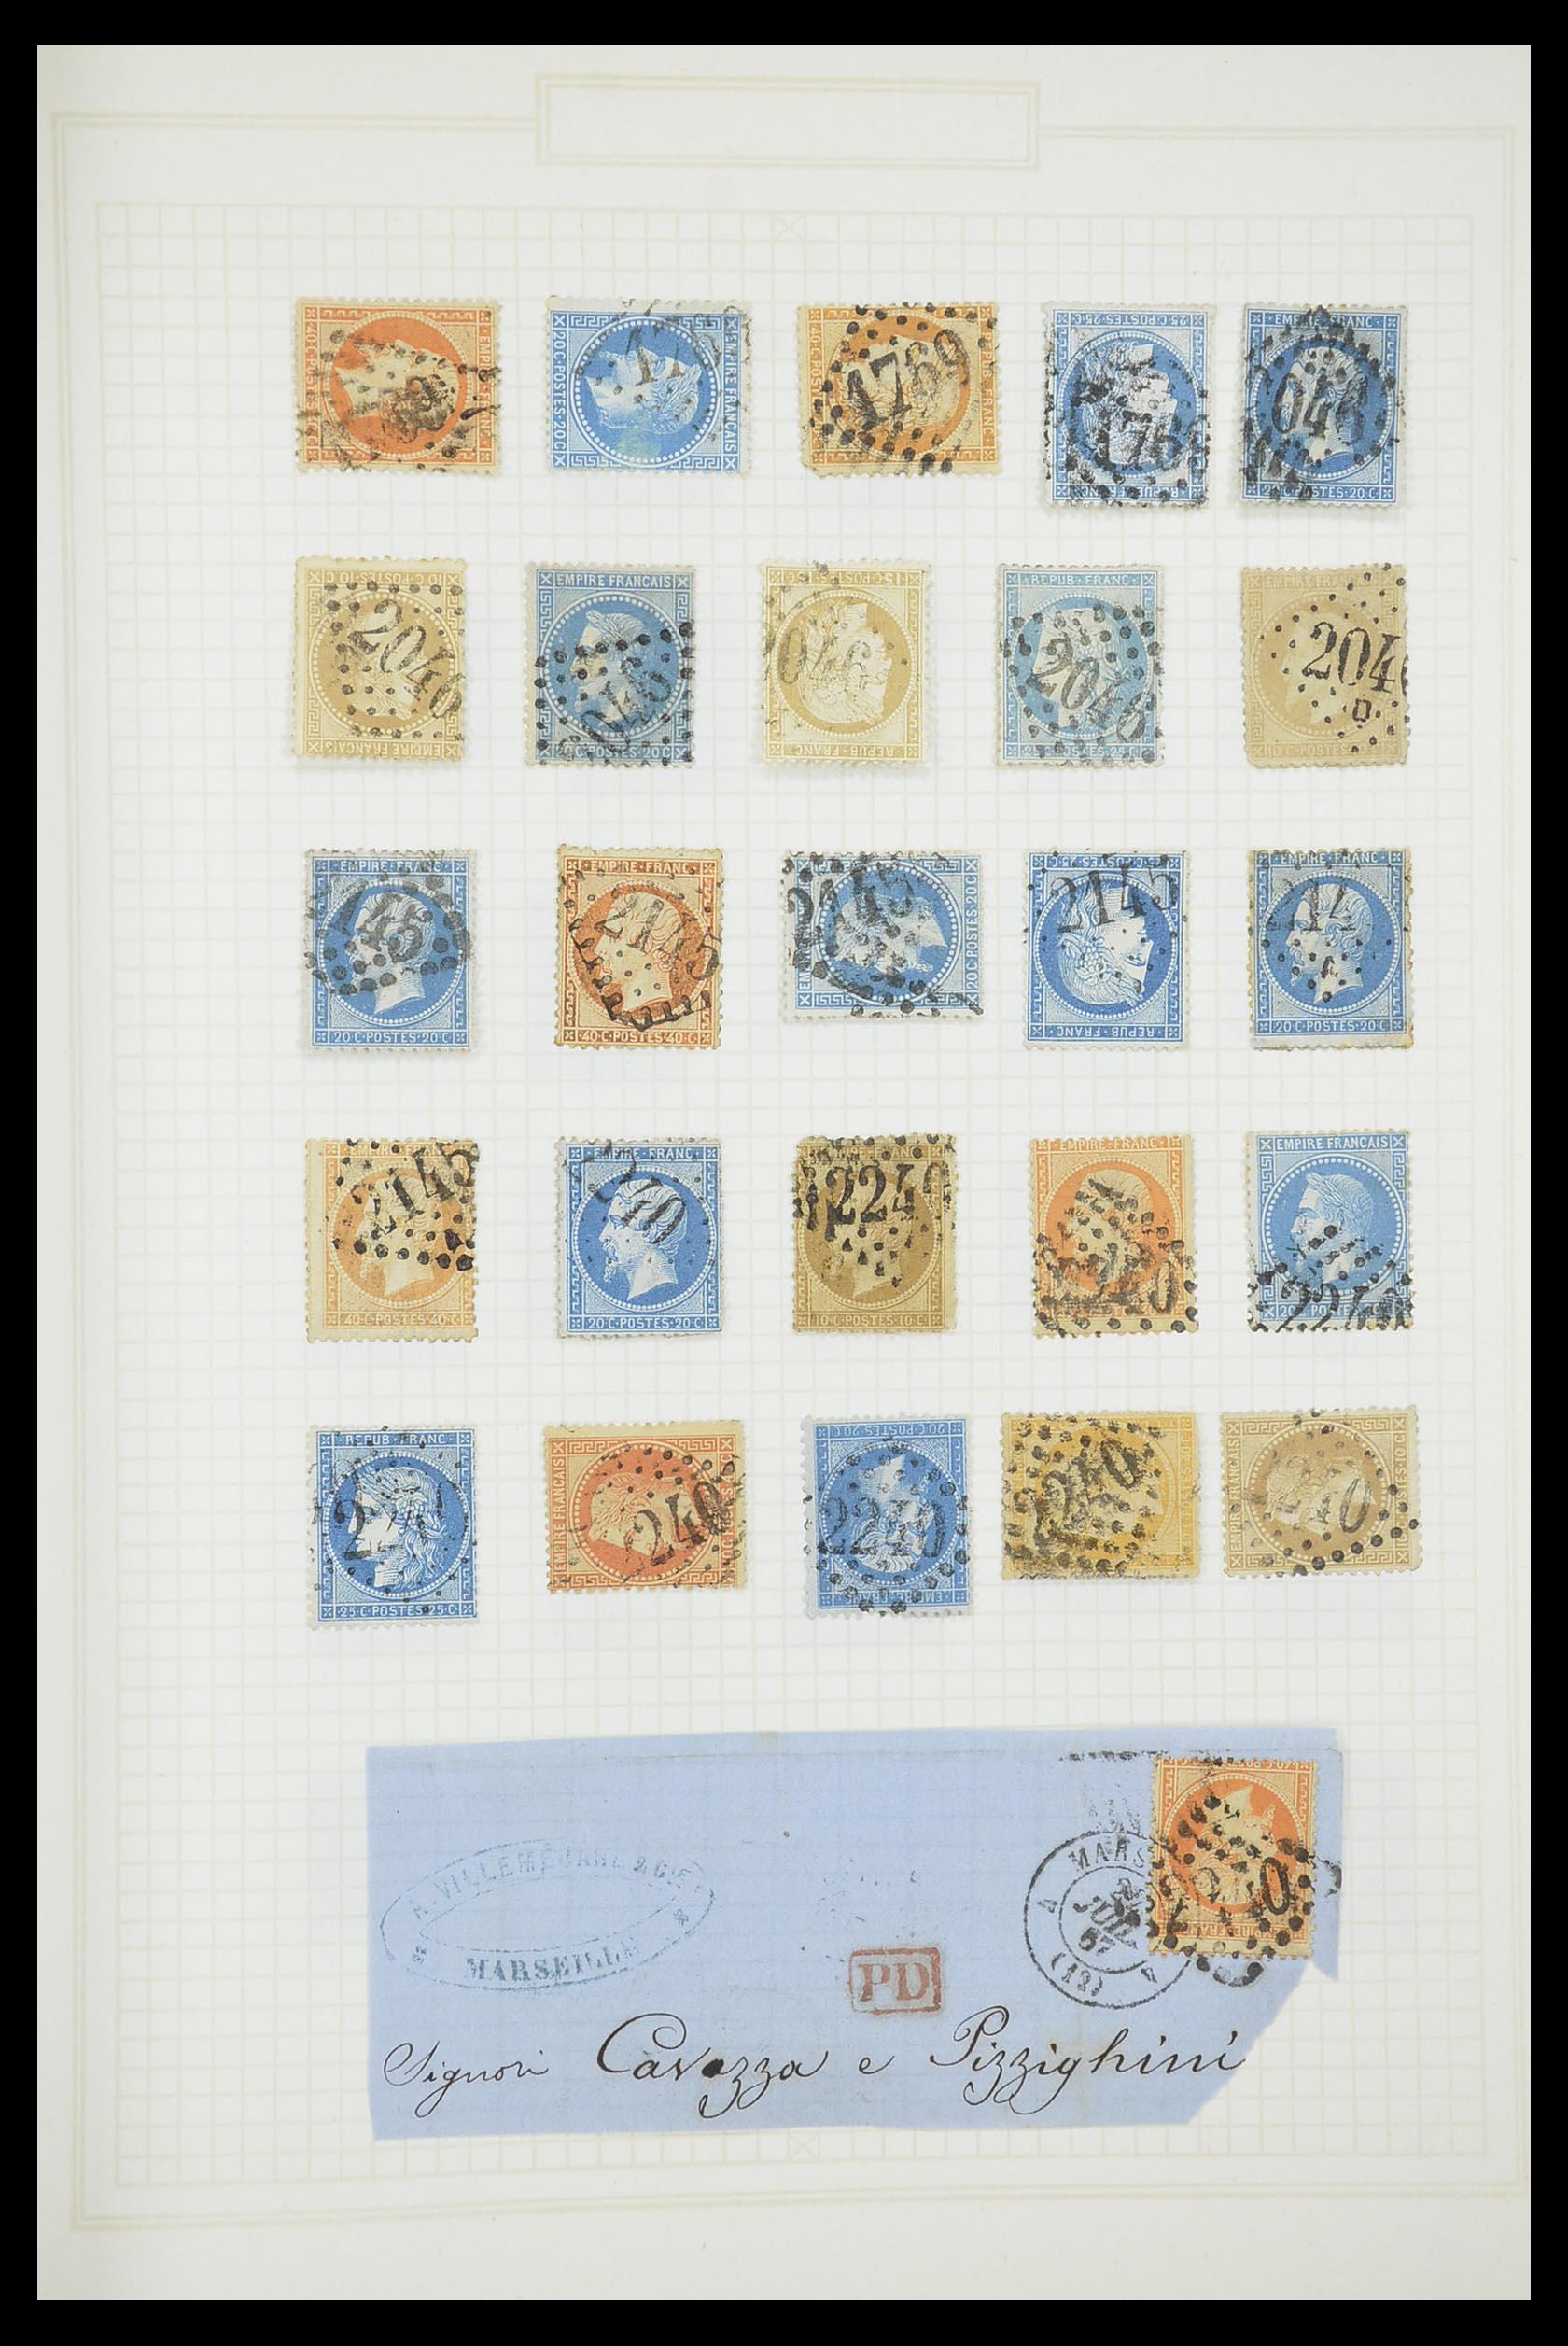 33851 012 - Postzegelverzameling 33851 Frankrijk klassiek stempels.